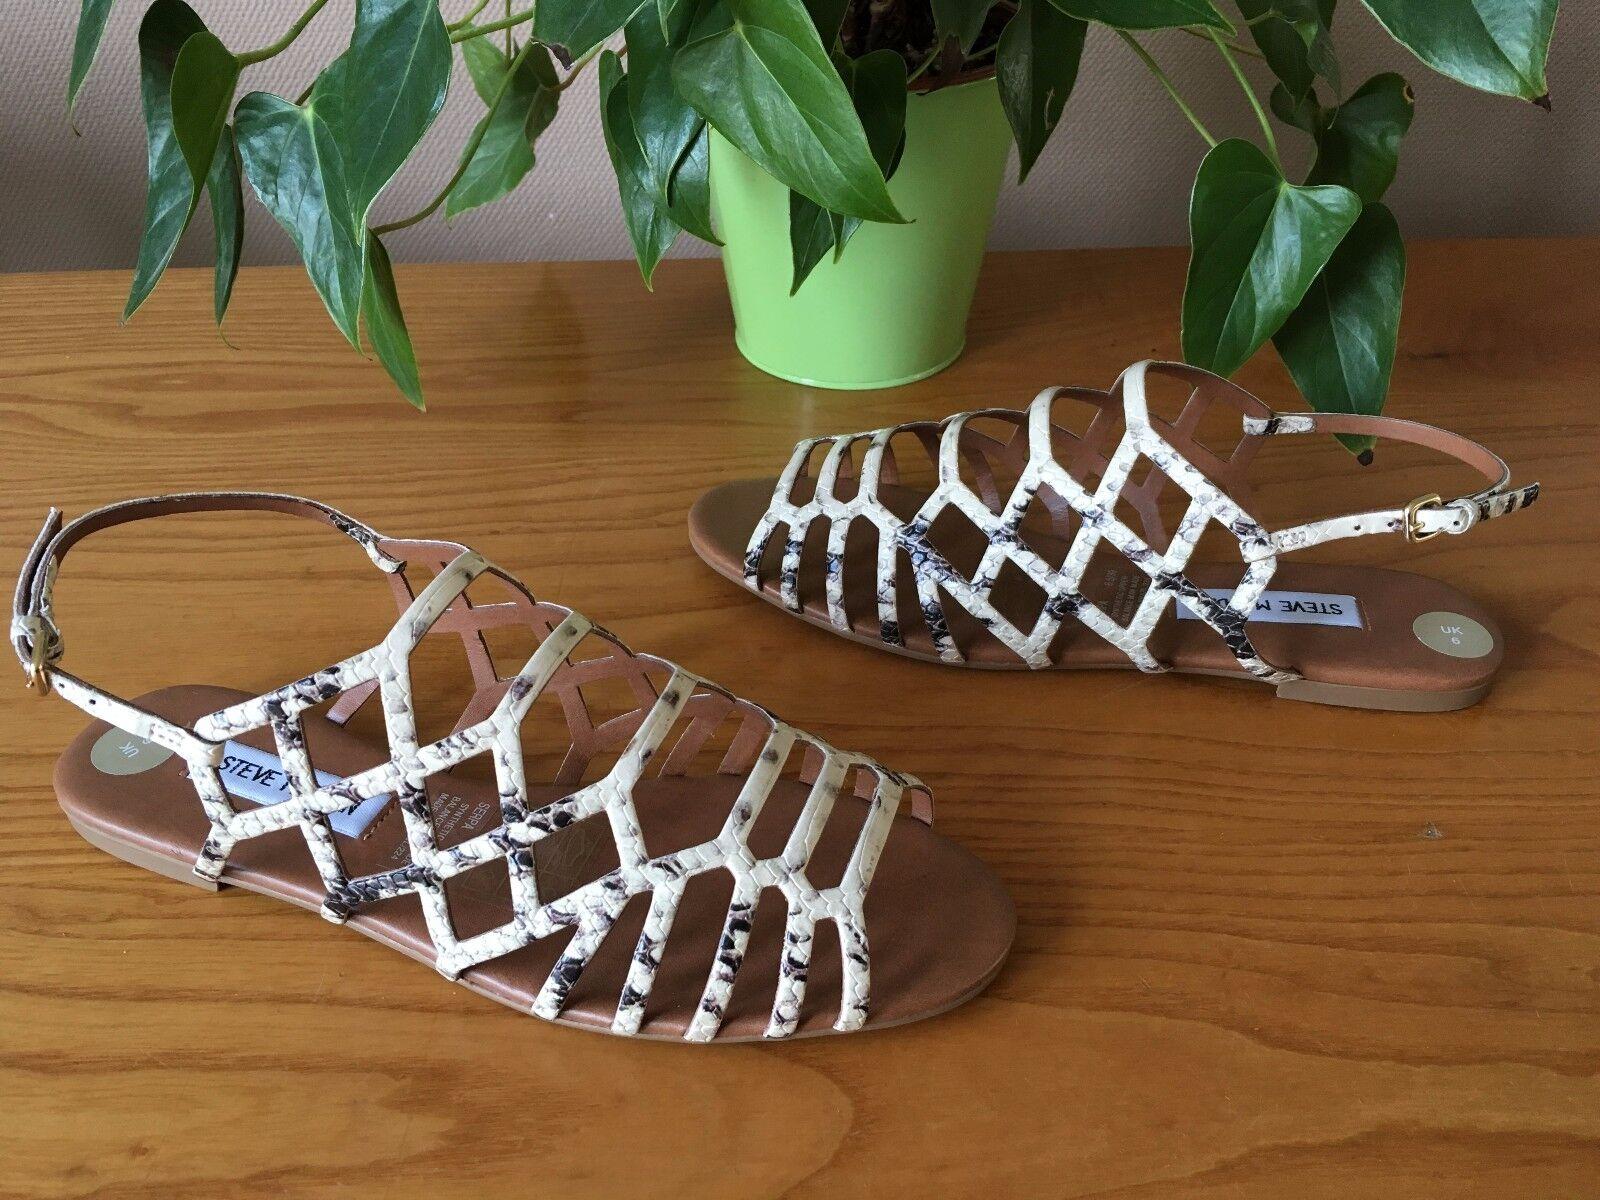 Steve Madden Beige Serpiente Diseño Gladiador Sandalias Planas Uk Uk Uk 6 EU 39 nuevo PVP  grandes ofertas